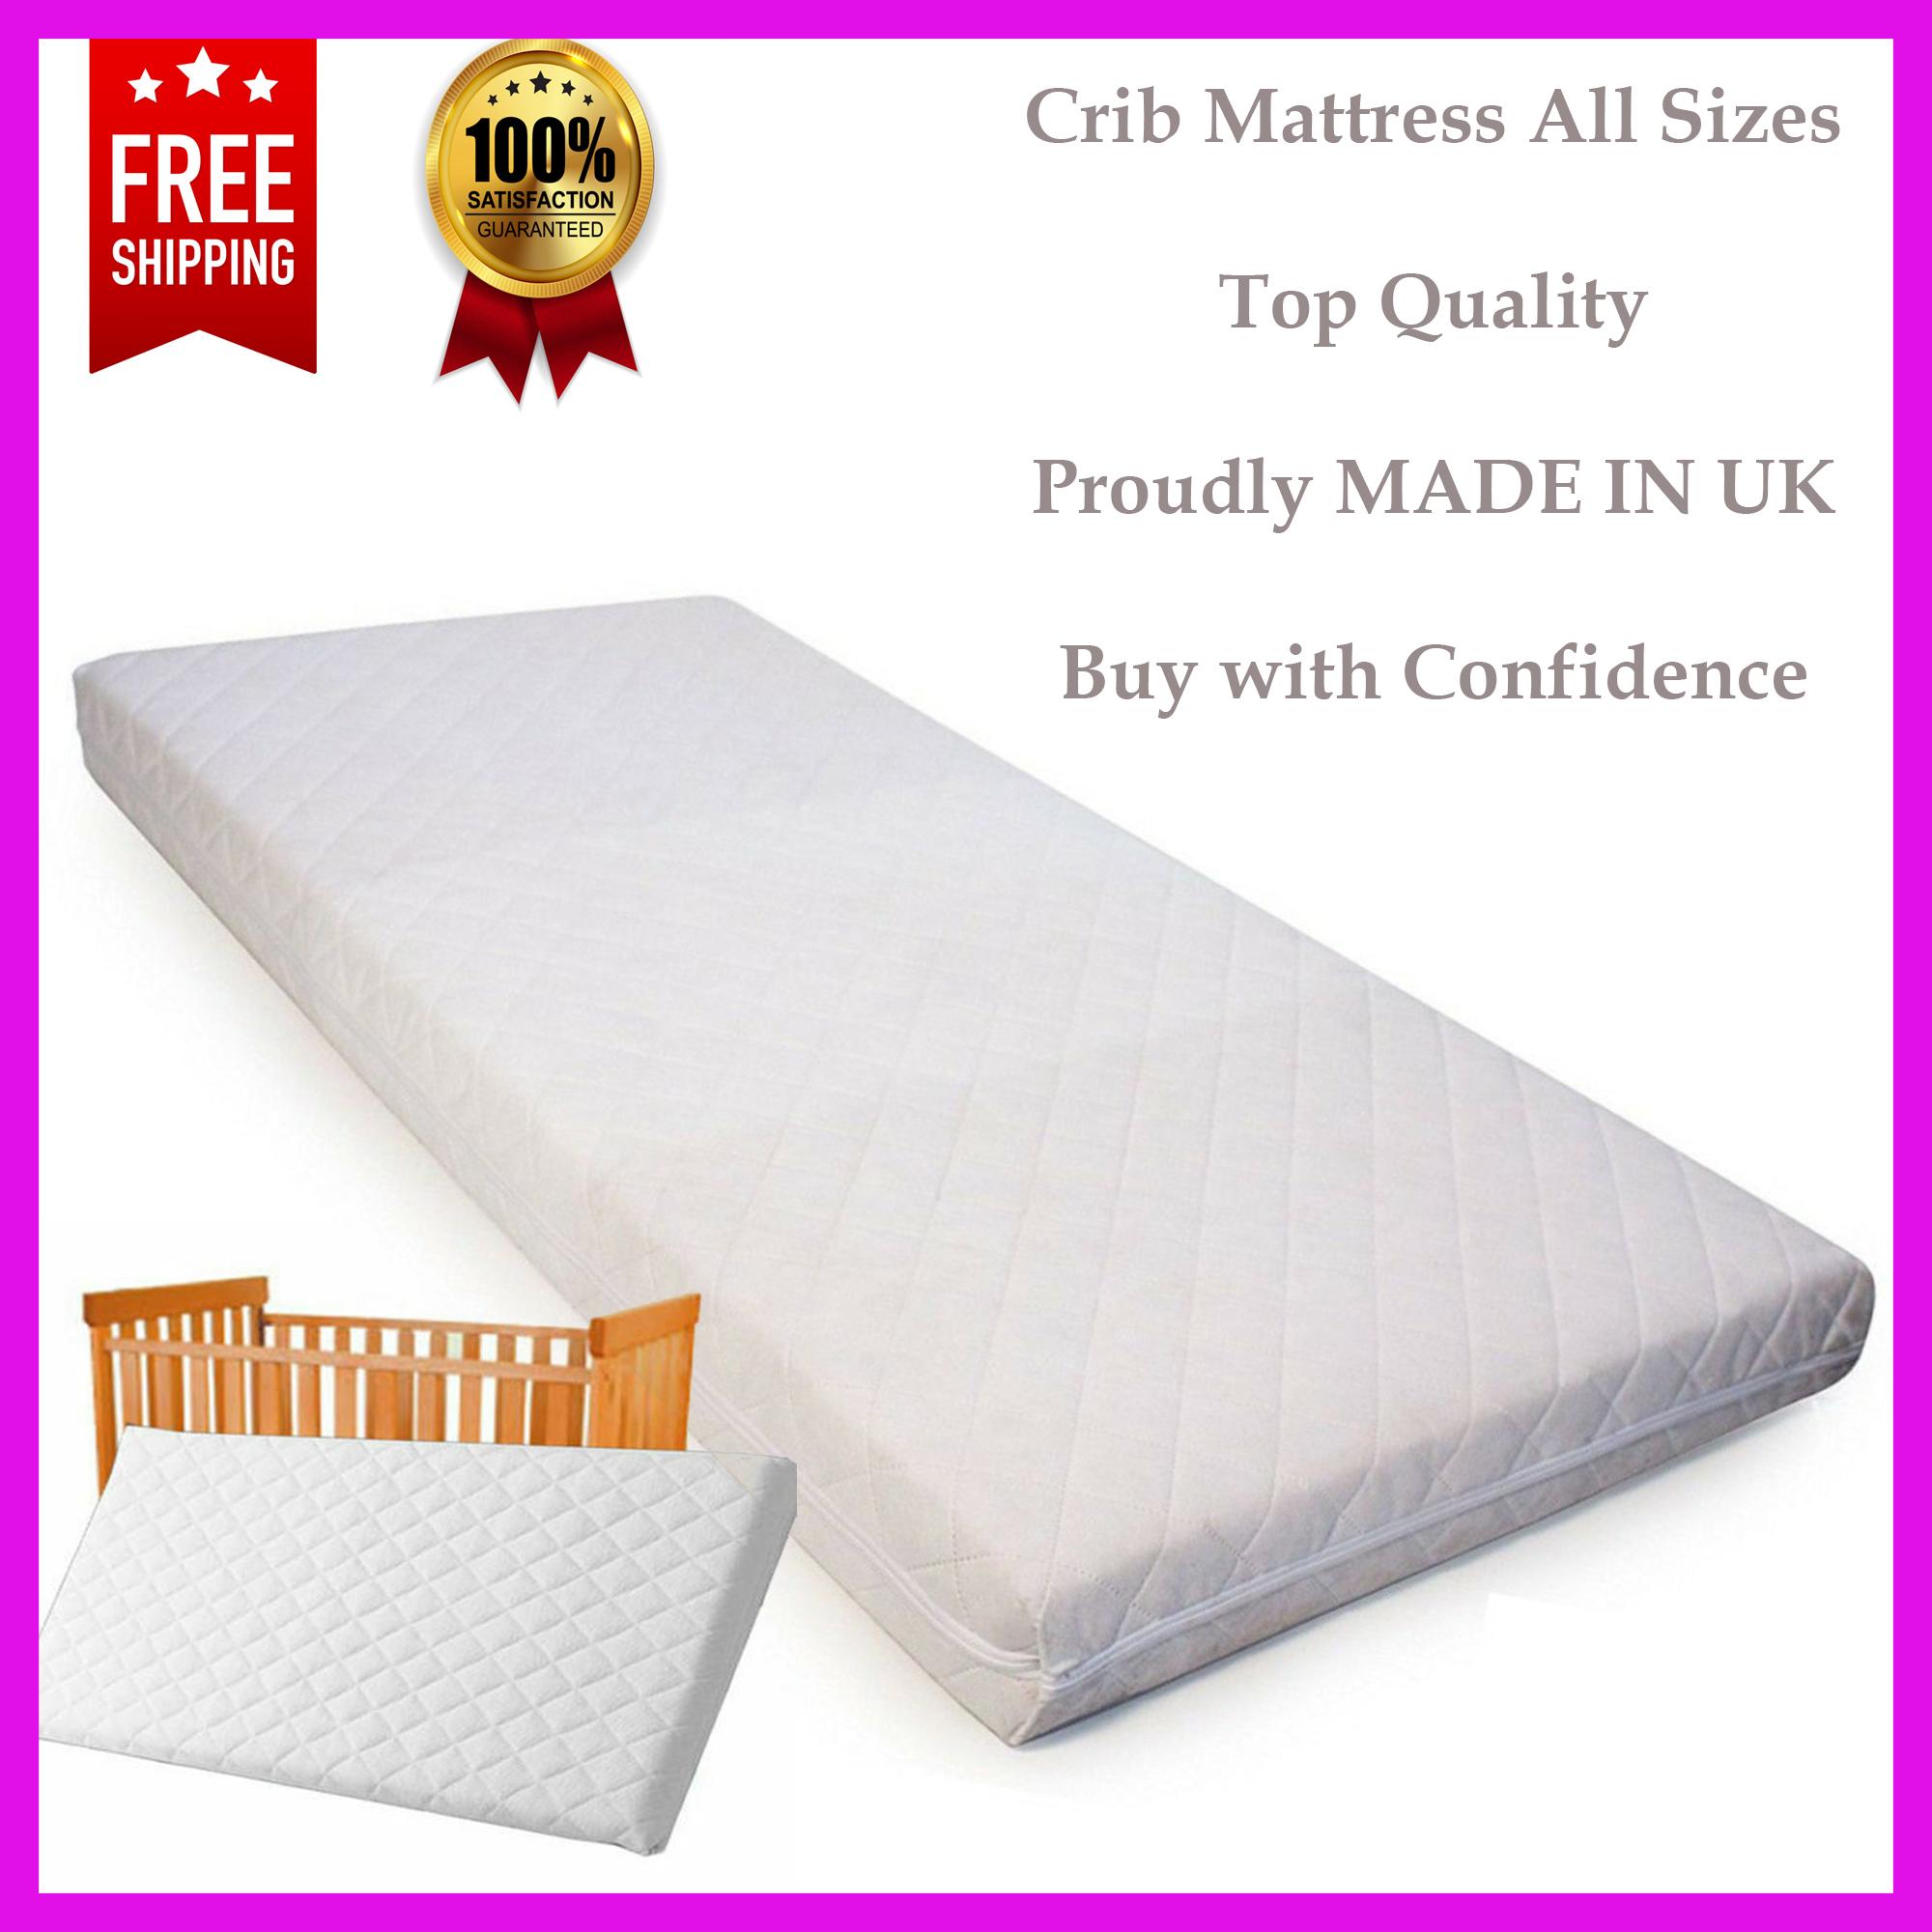 75 x 36 x 4 cm Crib Mattress Nursery Baby Breathable Waterproof Cradle Pram Swing Mattresses